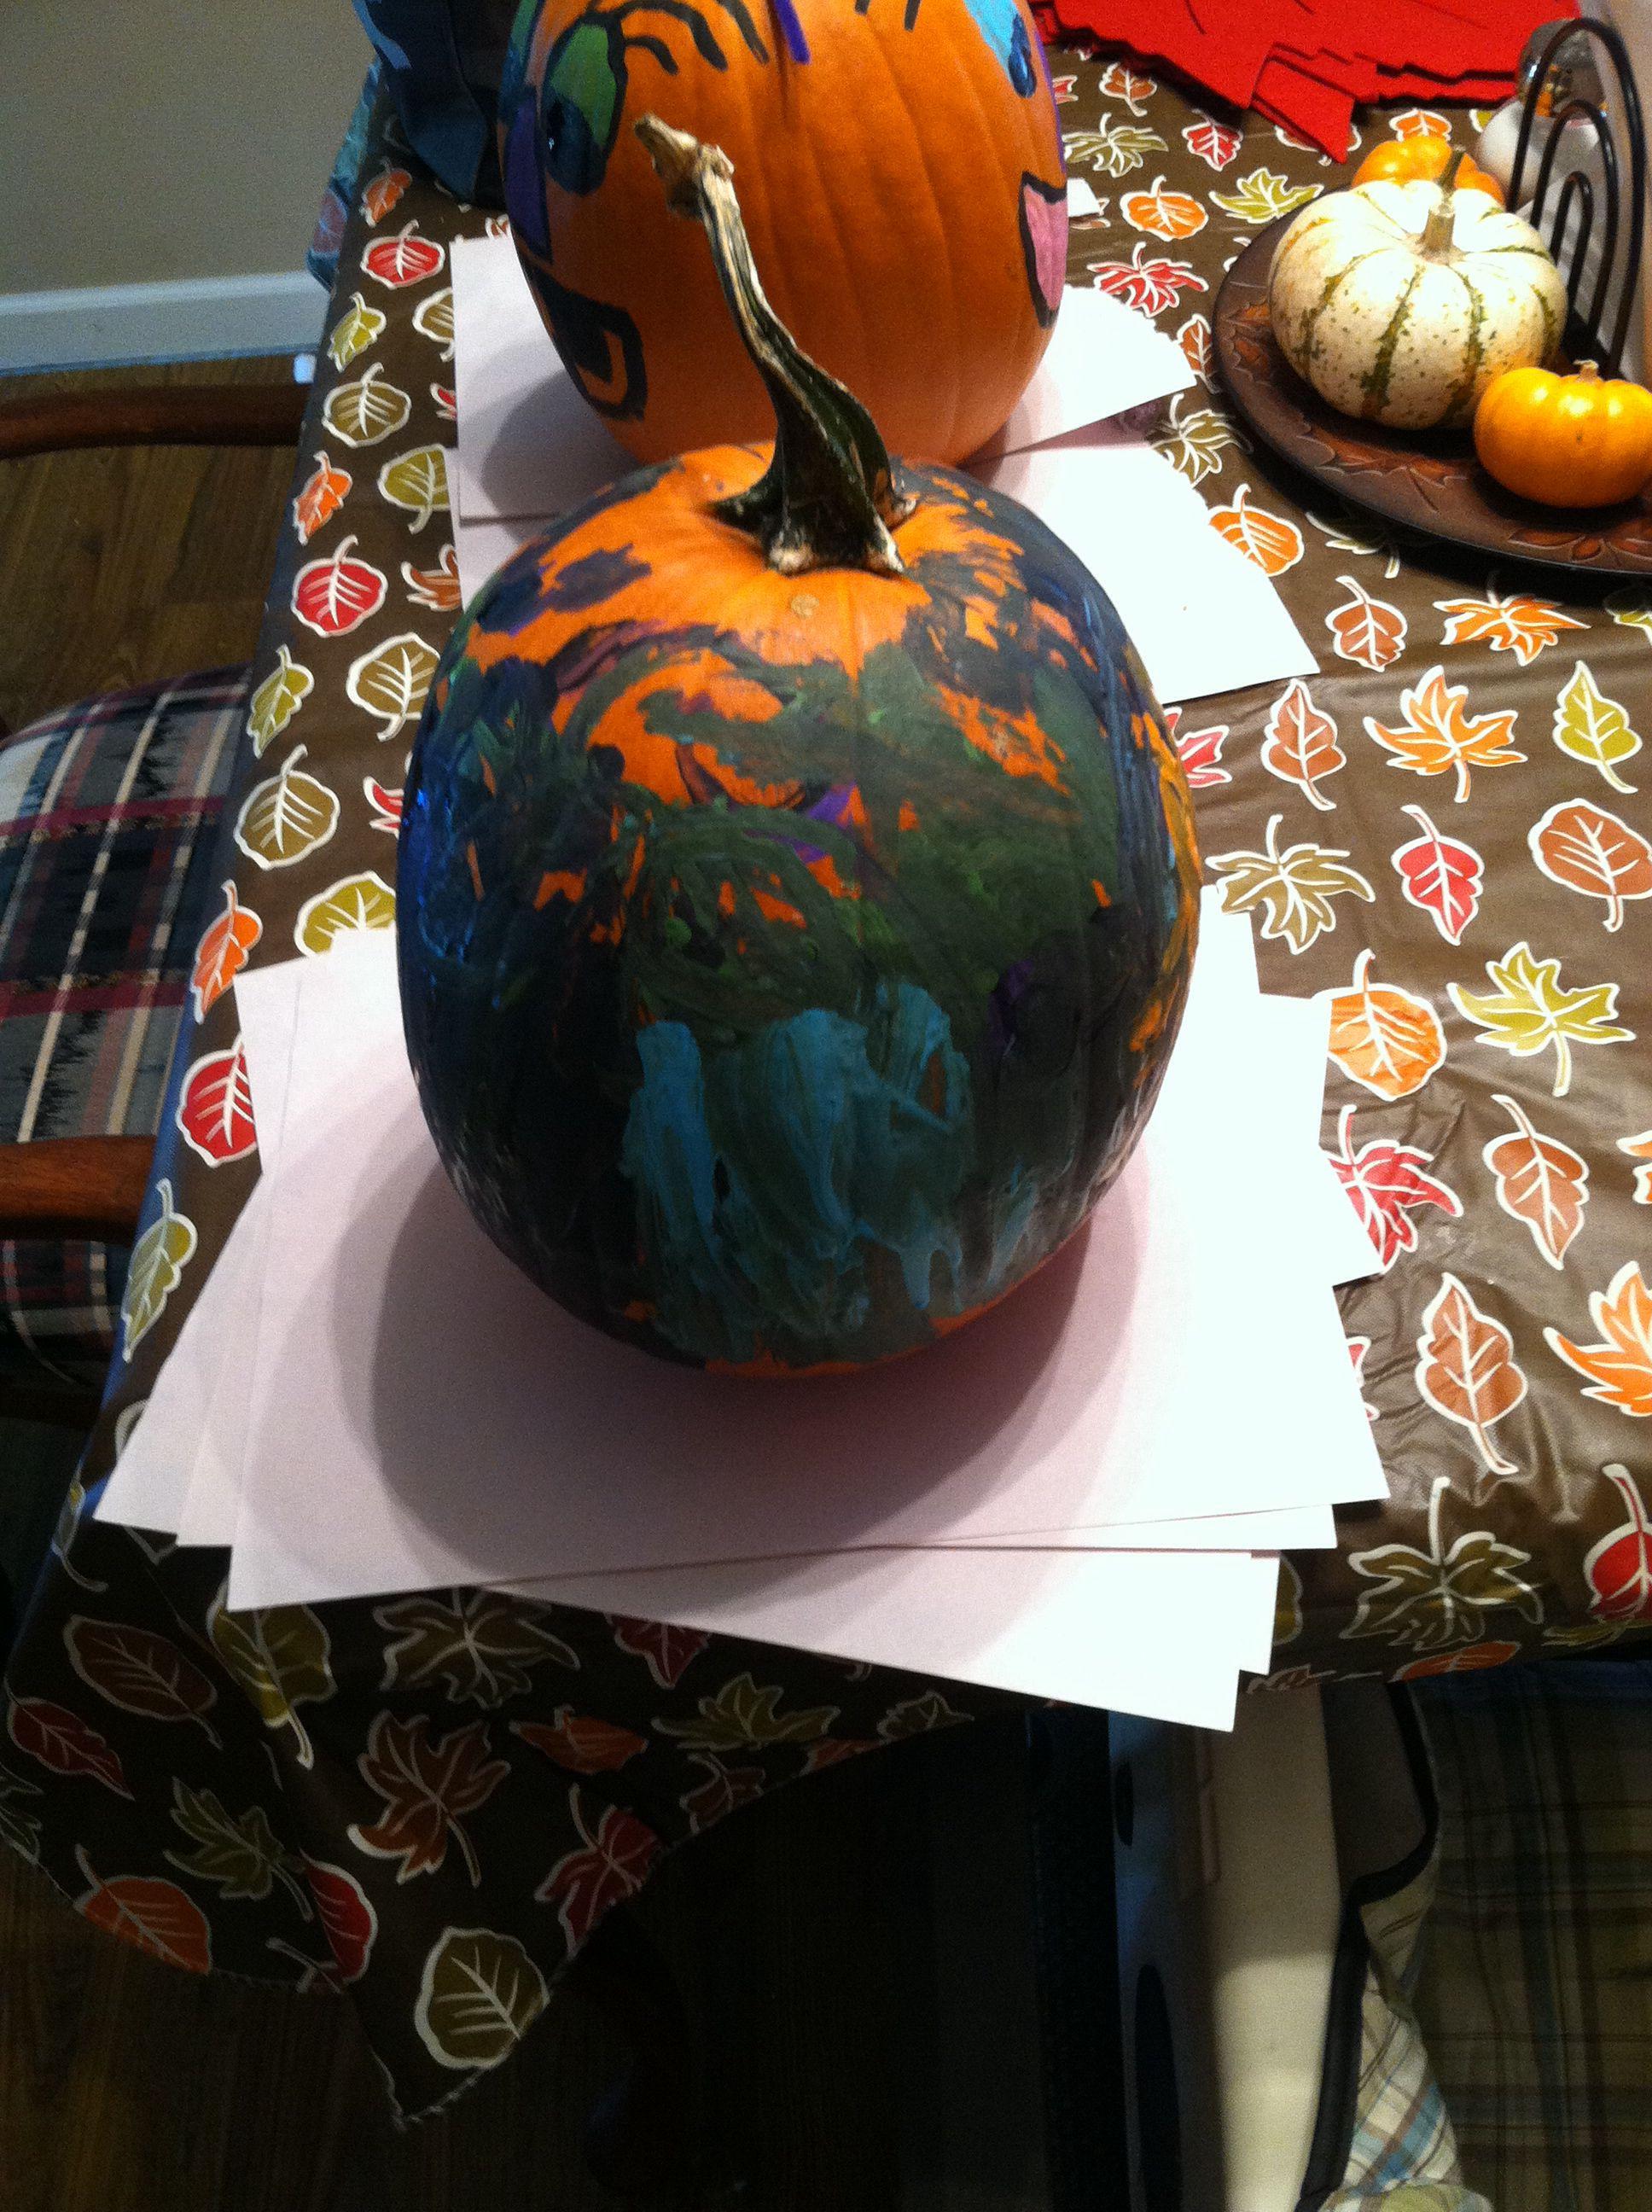 Pumpkin Decorating With A Toddler A Big Pumpkin